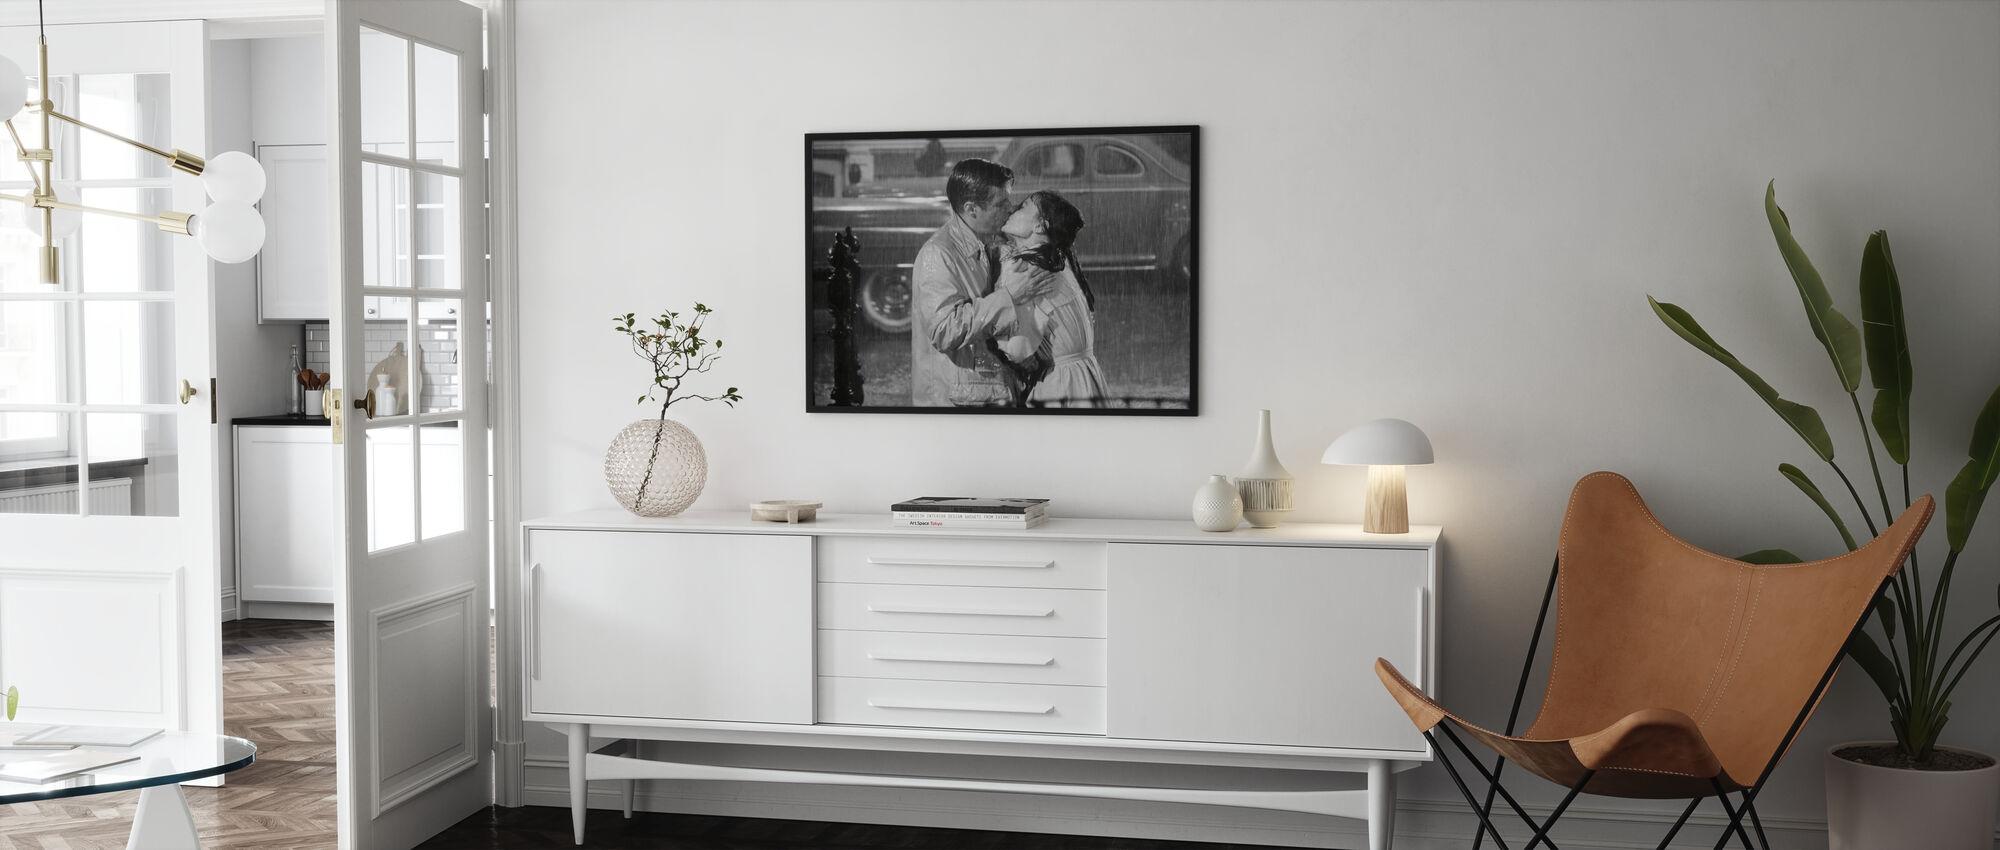 Audrey Hepburn and George Peppard in Breakfast at Tiffanys - Framed print - Living Room